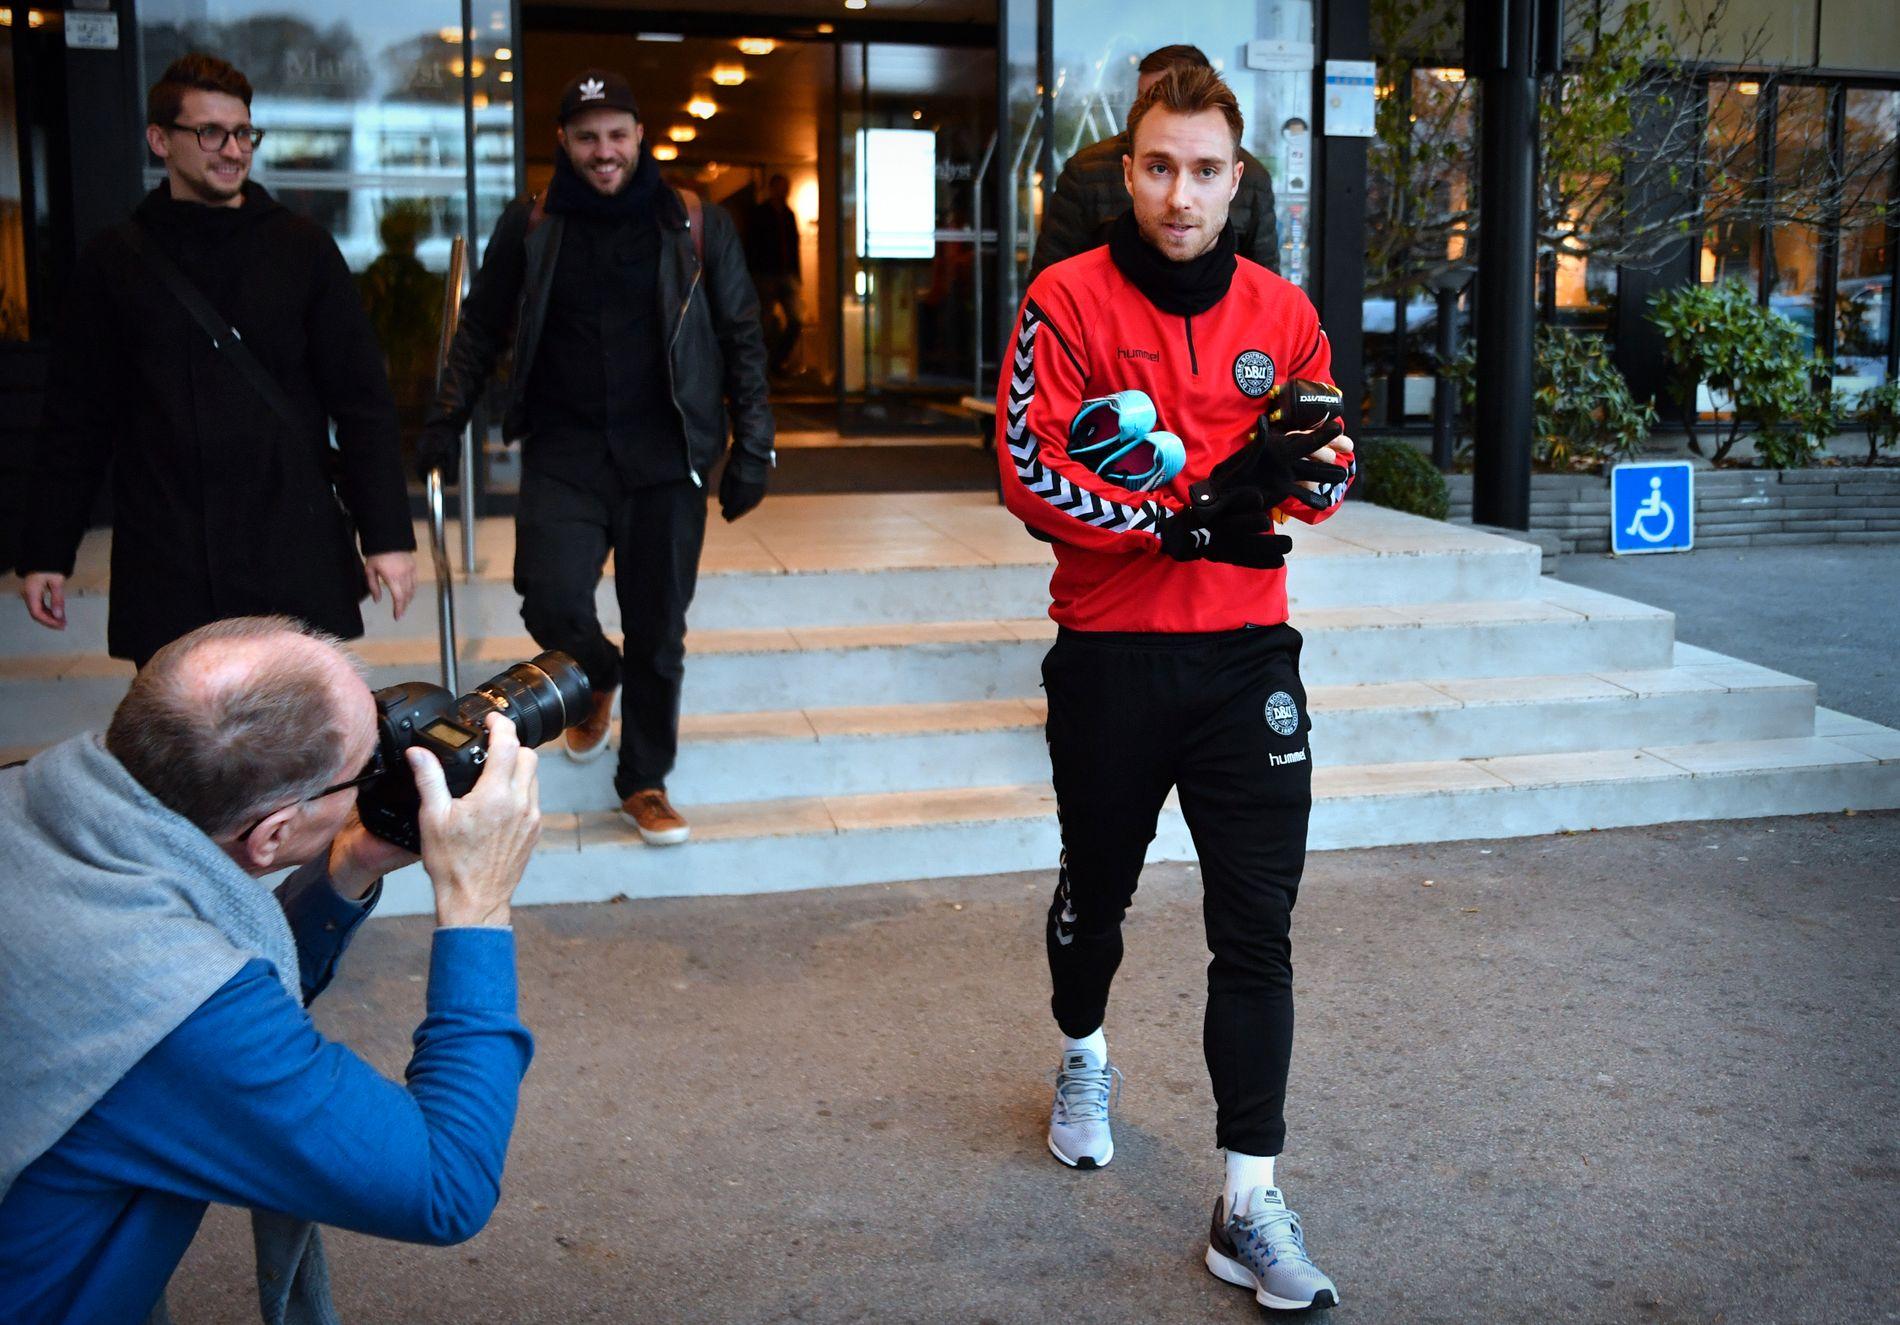 KLAR FOR IRLAND: Christian Eriksen og Danmark er igang med forberedelsene foran lørdagens VM-playoff mot Irland. Foto: BJØRN S. DELEBEKK, VG